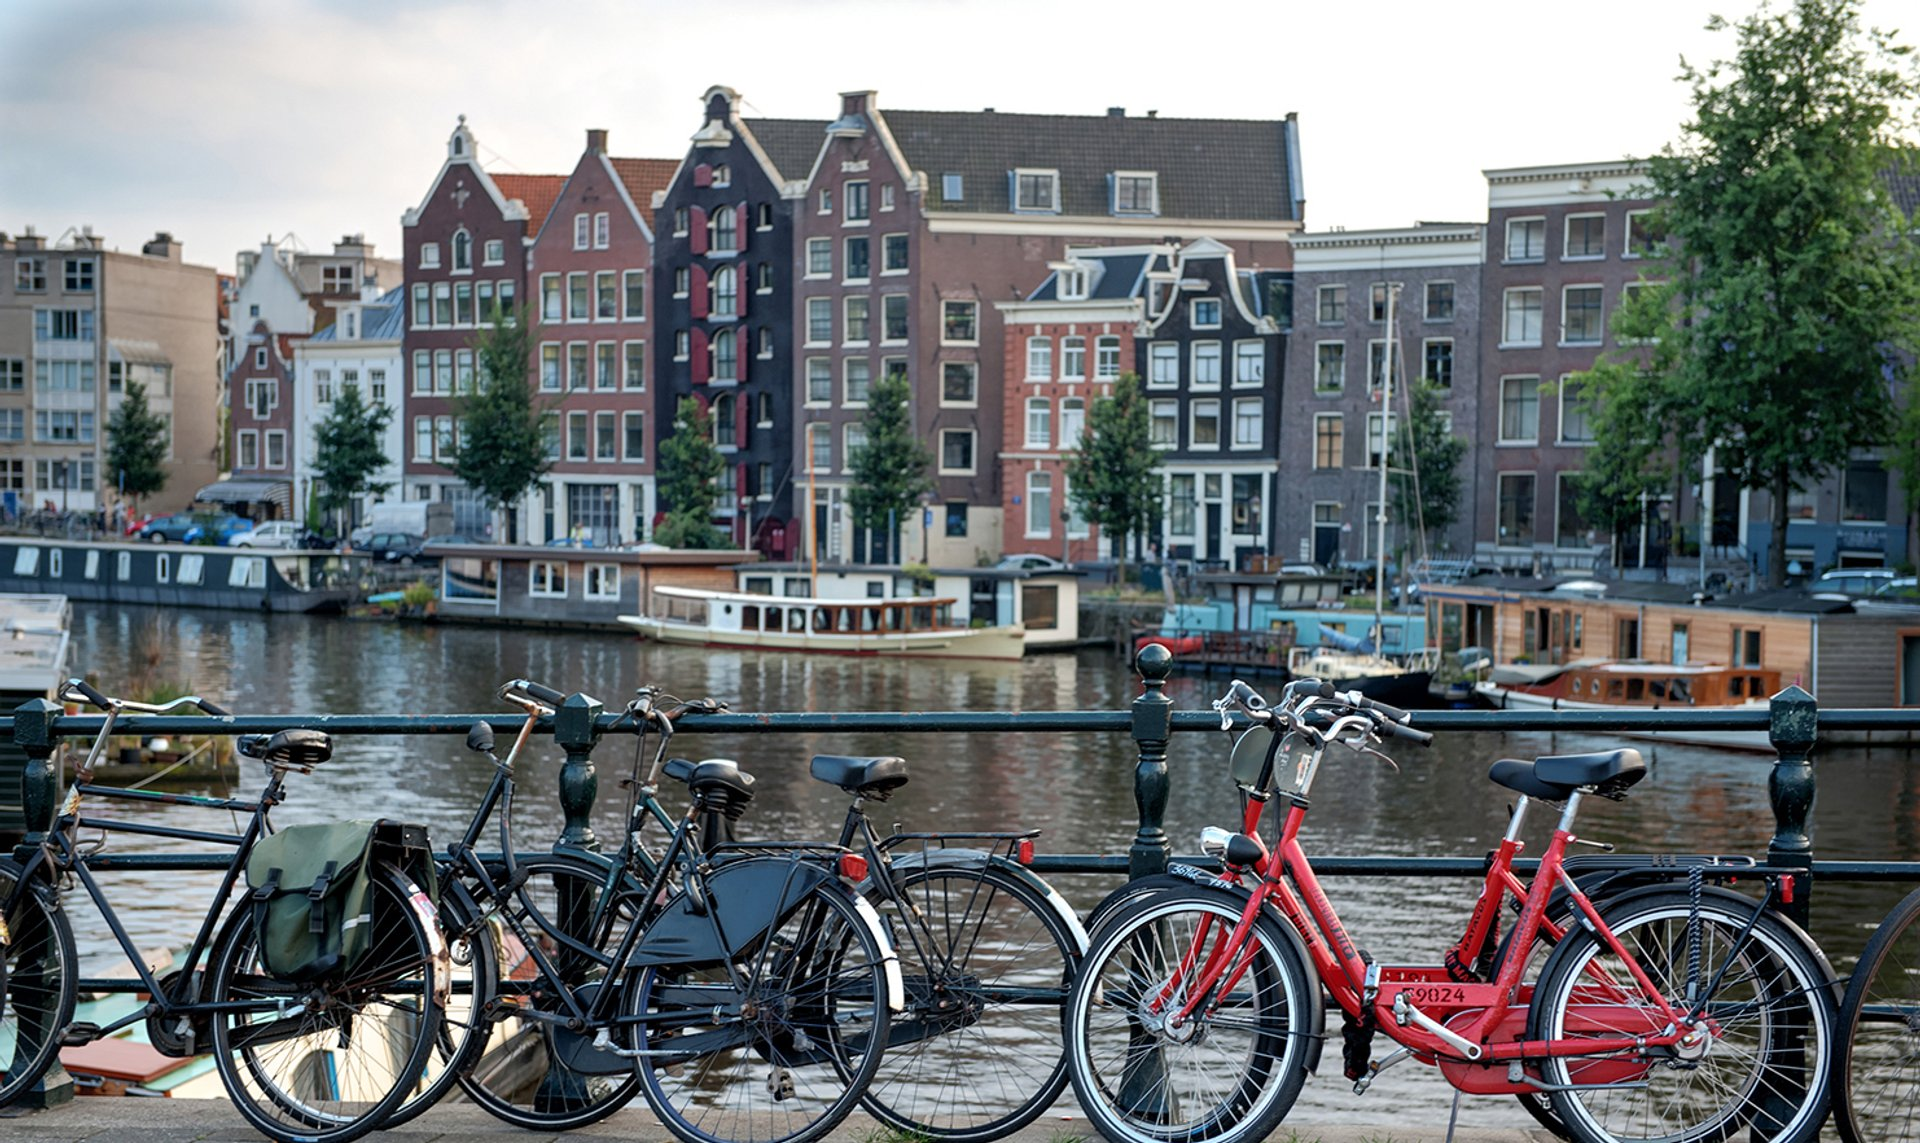 Biking in Amsterdam 2020 - Best Time